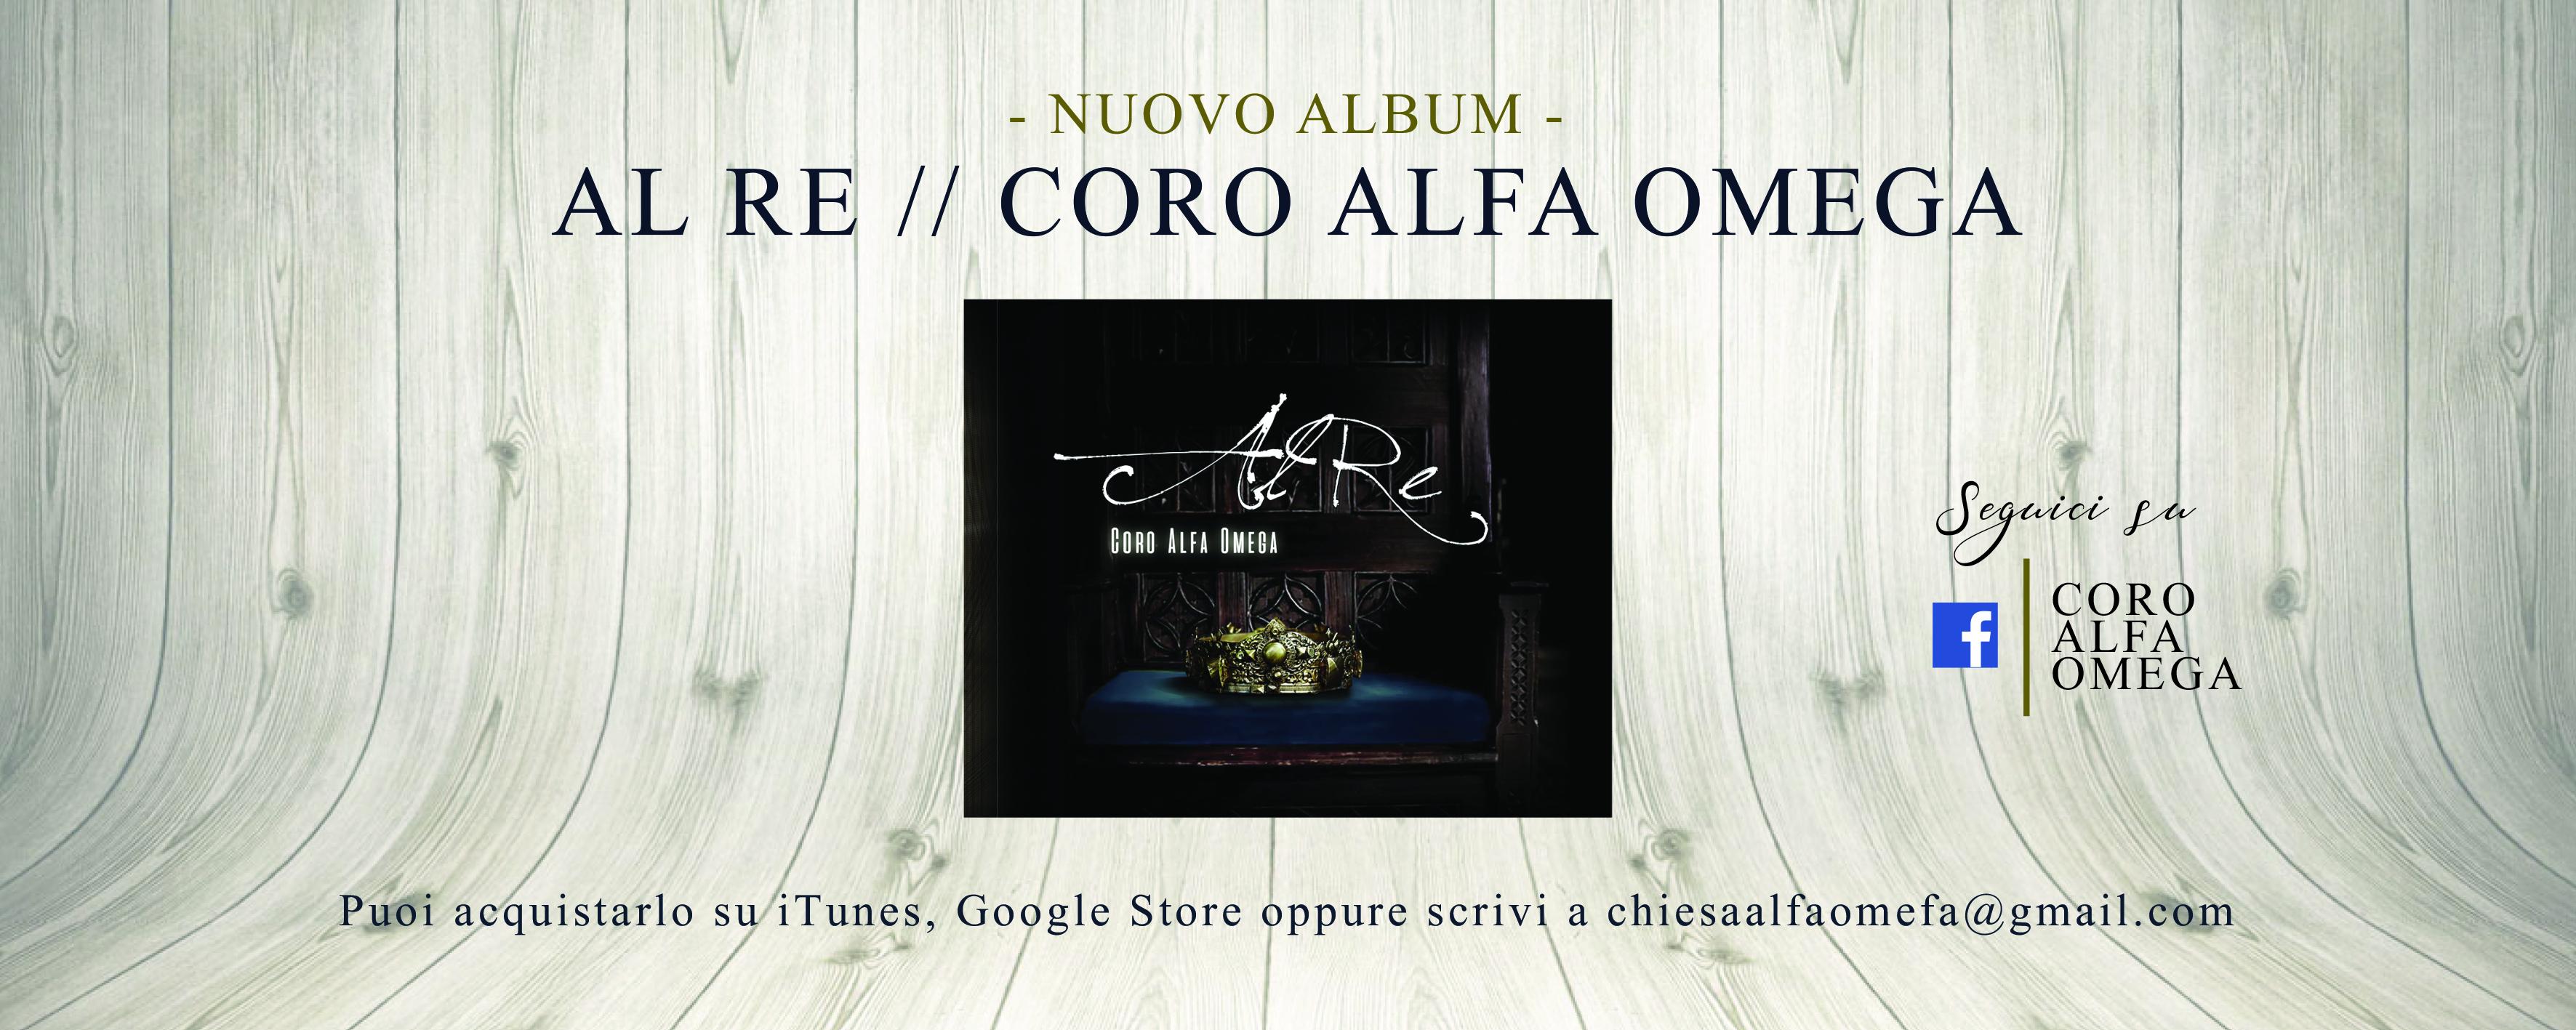 coro-alfa-omega-cd-nuovo